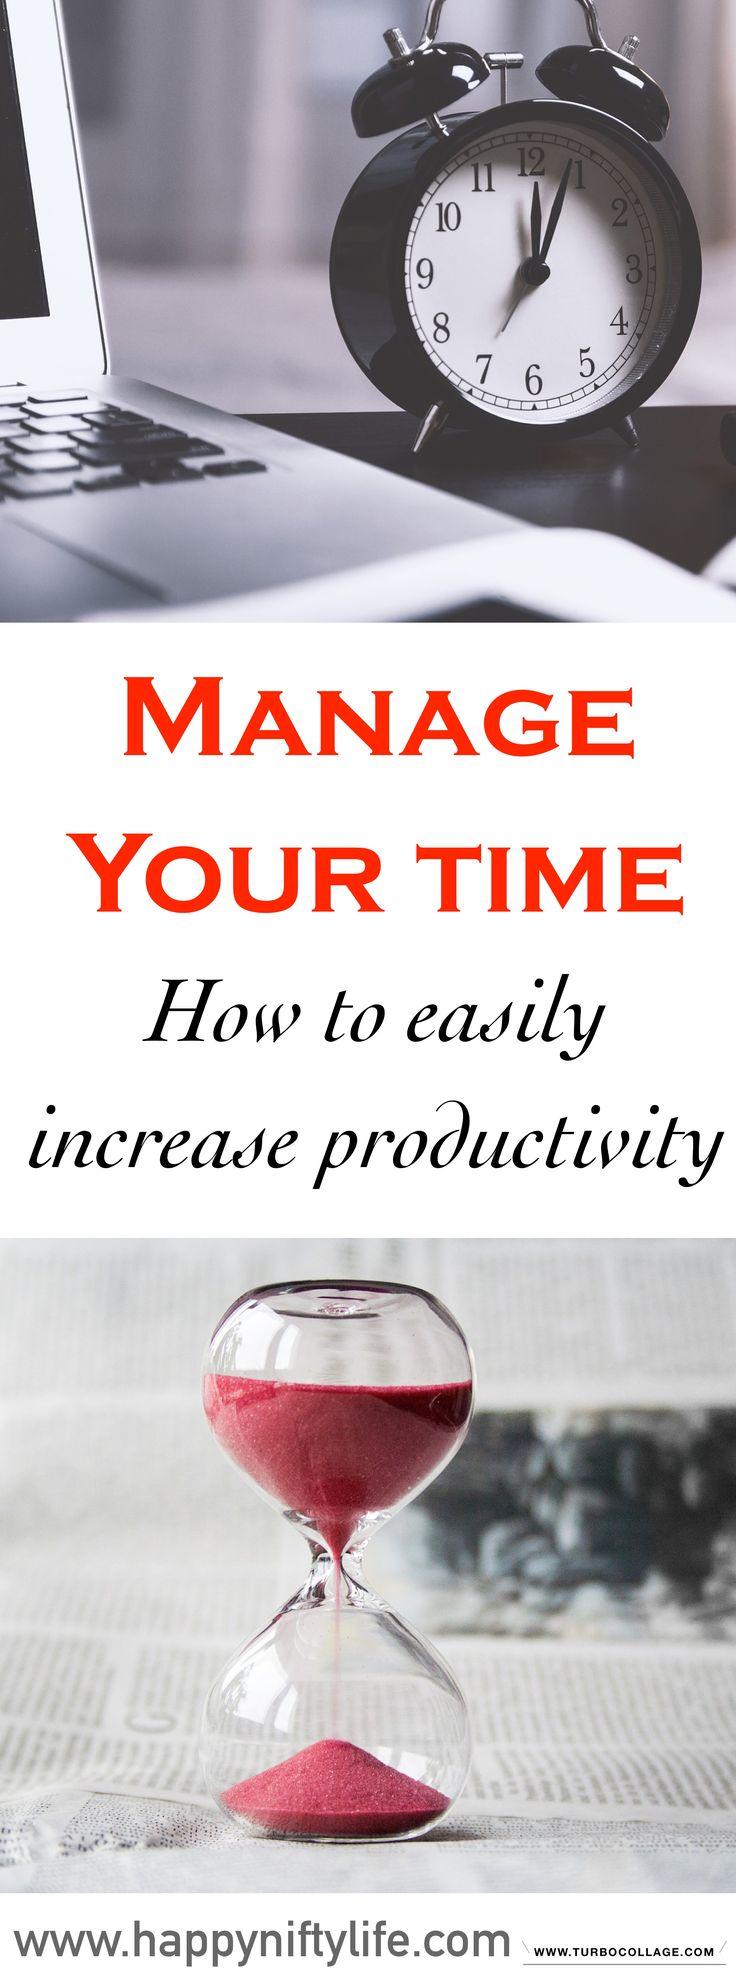 How to Increase Productivity, Eliminate Overwhelm and Organize Your Business and Life in 2018 #newyearsresolution #goalsetting #productivity #bemoreproductive #setgoals #slayyourgoals #crushyourgoals #reducestress #behappy #savetime